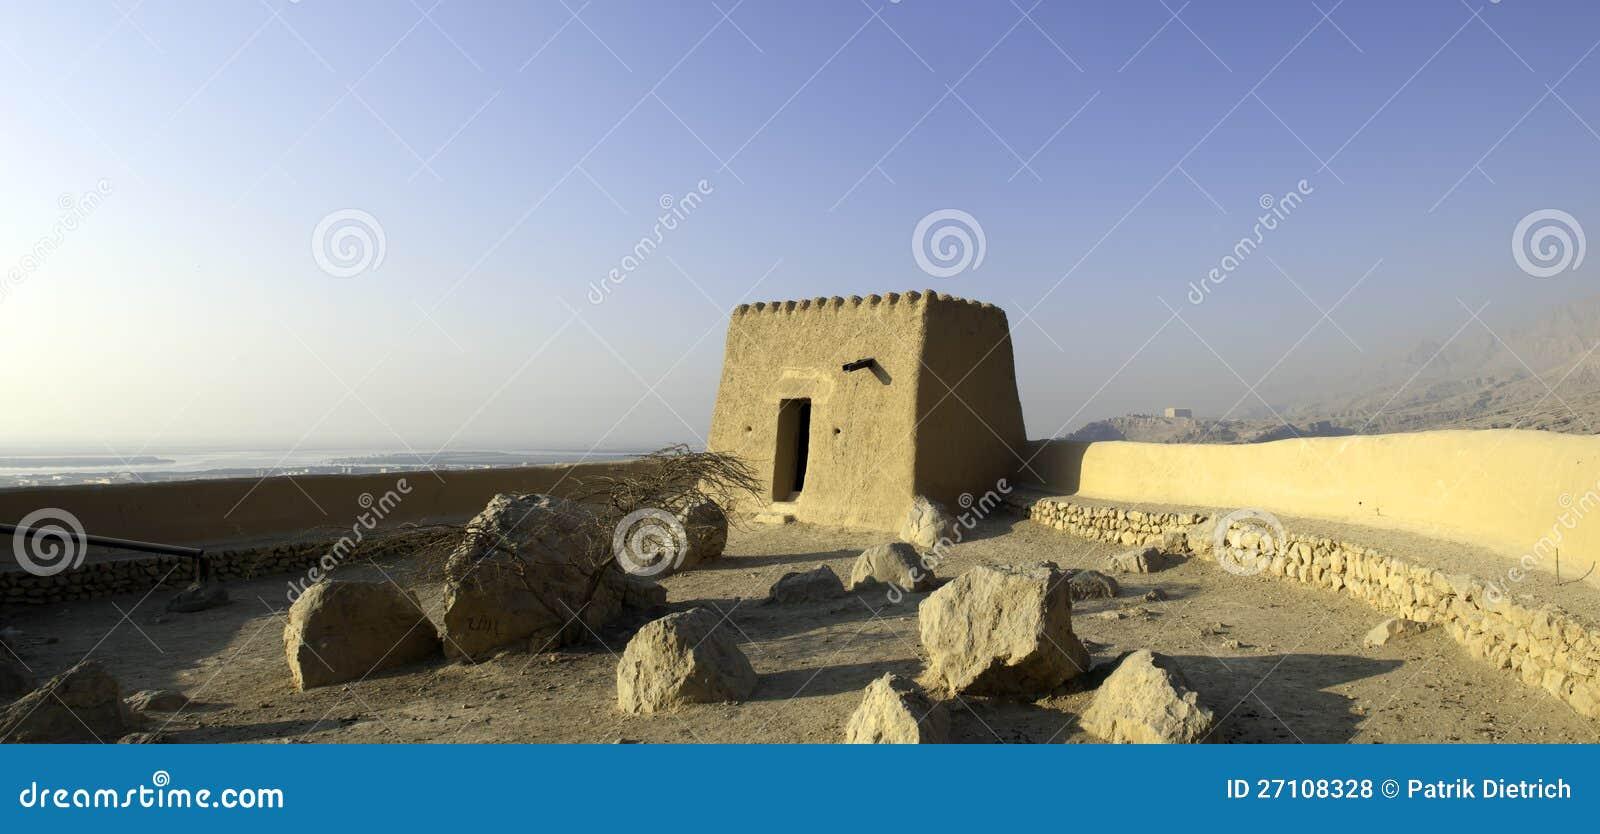 Arabian Fort in Ras al Khaimah Arab Emirates